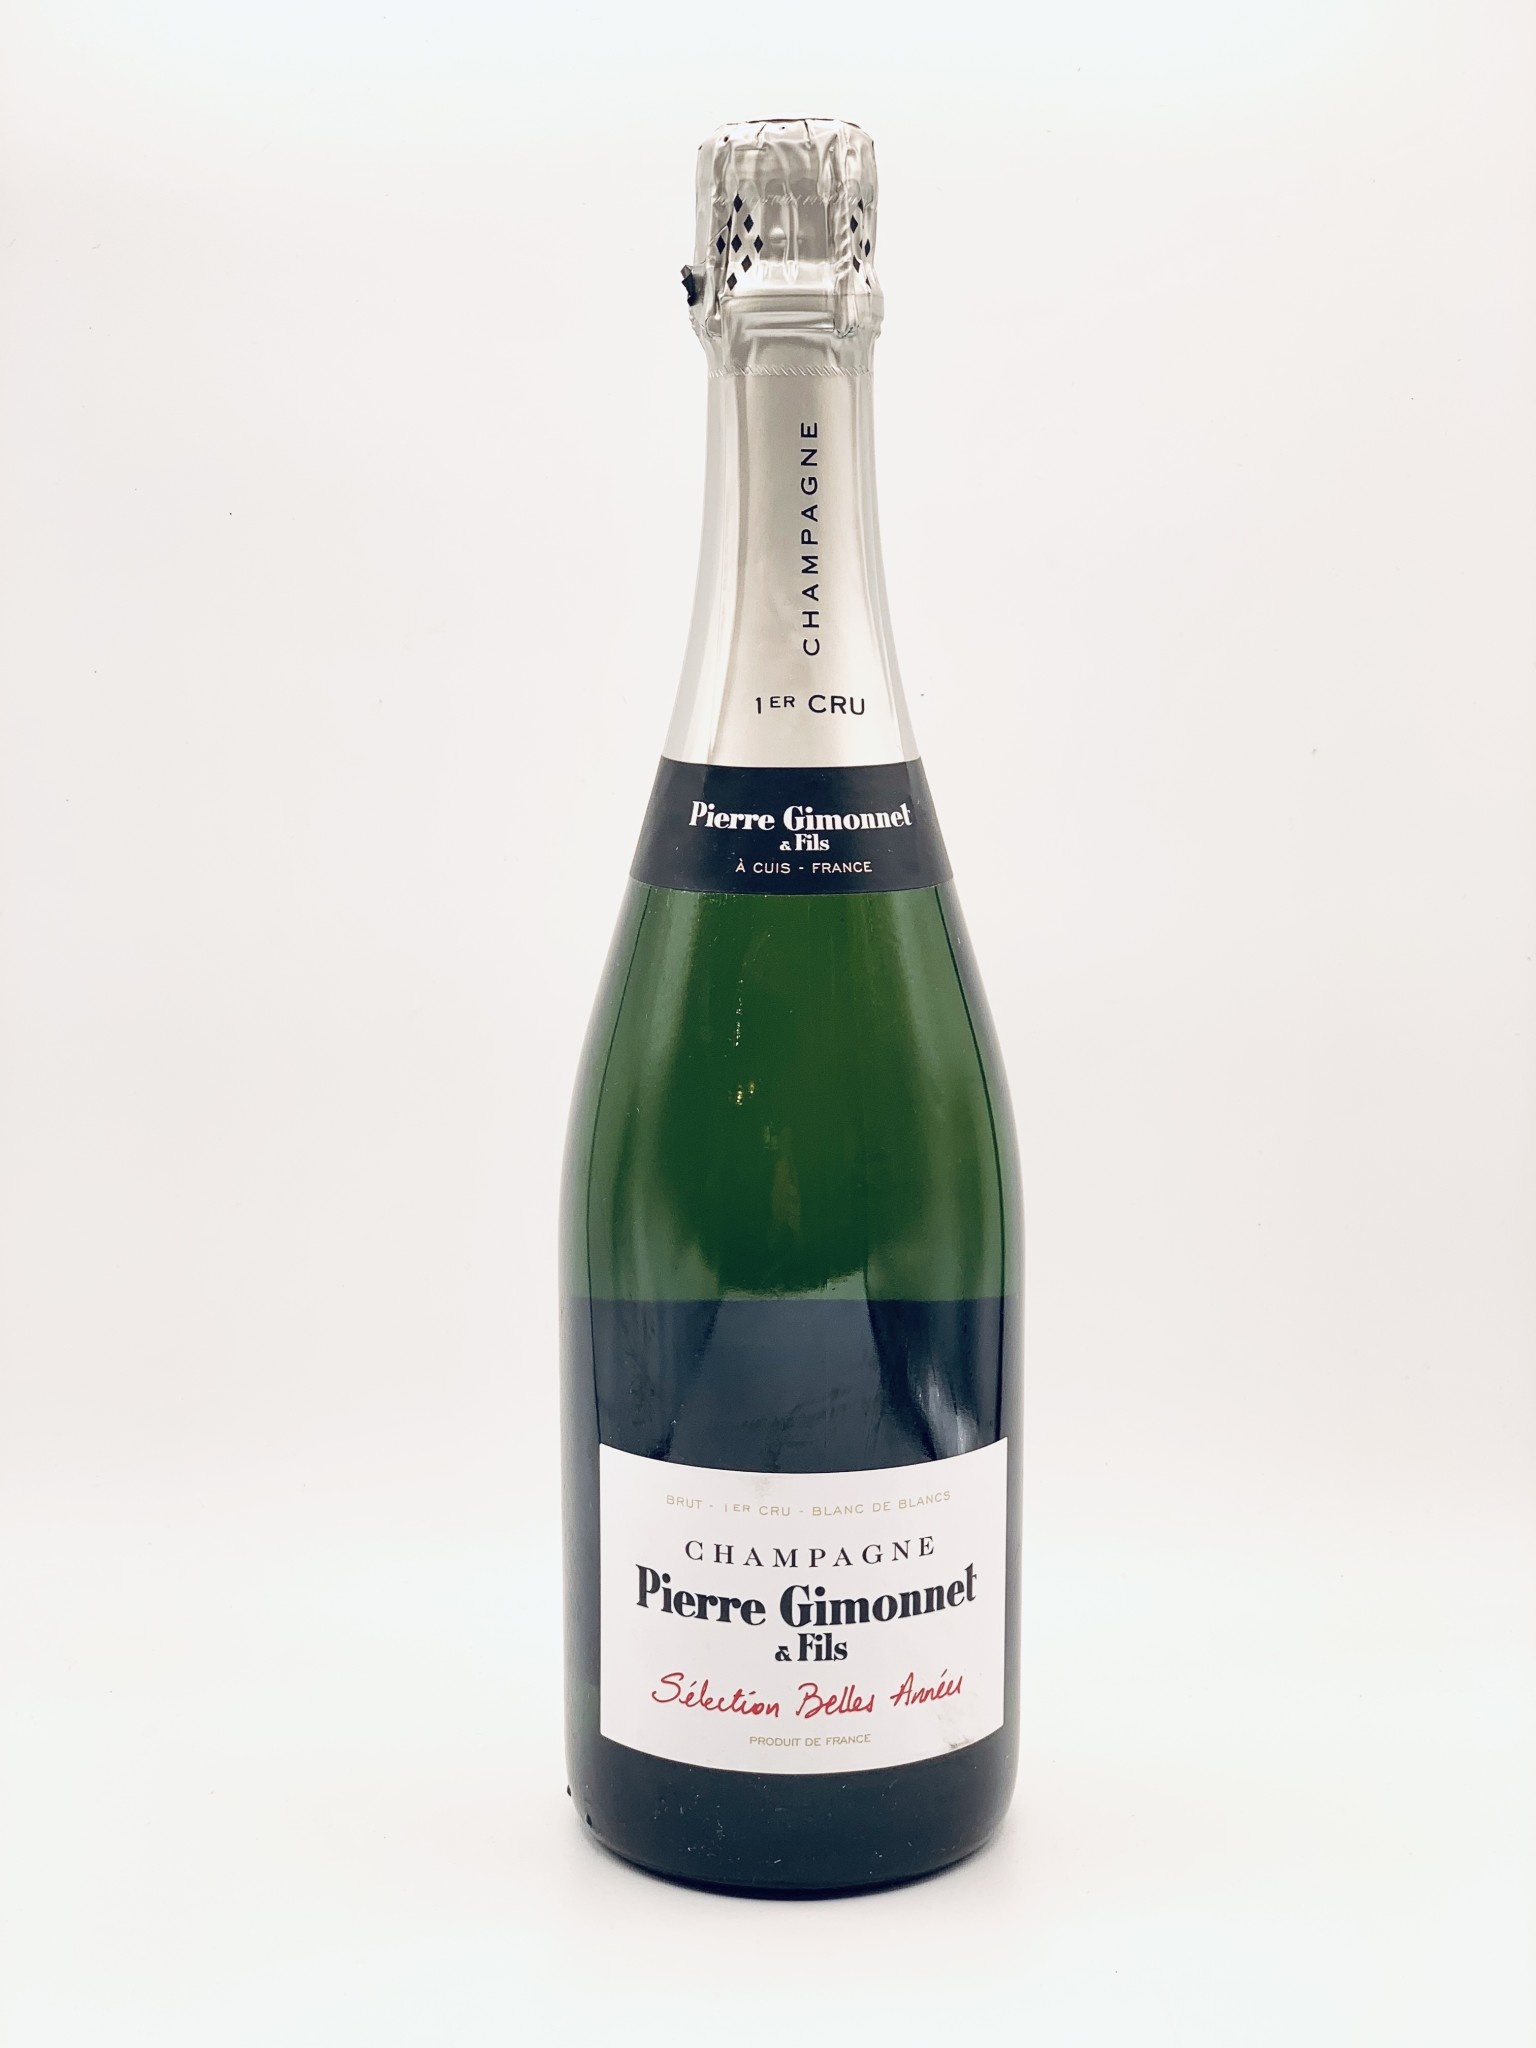 "Champagne Brut 1er Cru Blanc de Blancs NV Pierre Gimonnet ""Selection Belles Annees"" 750ml"